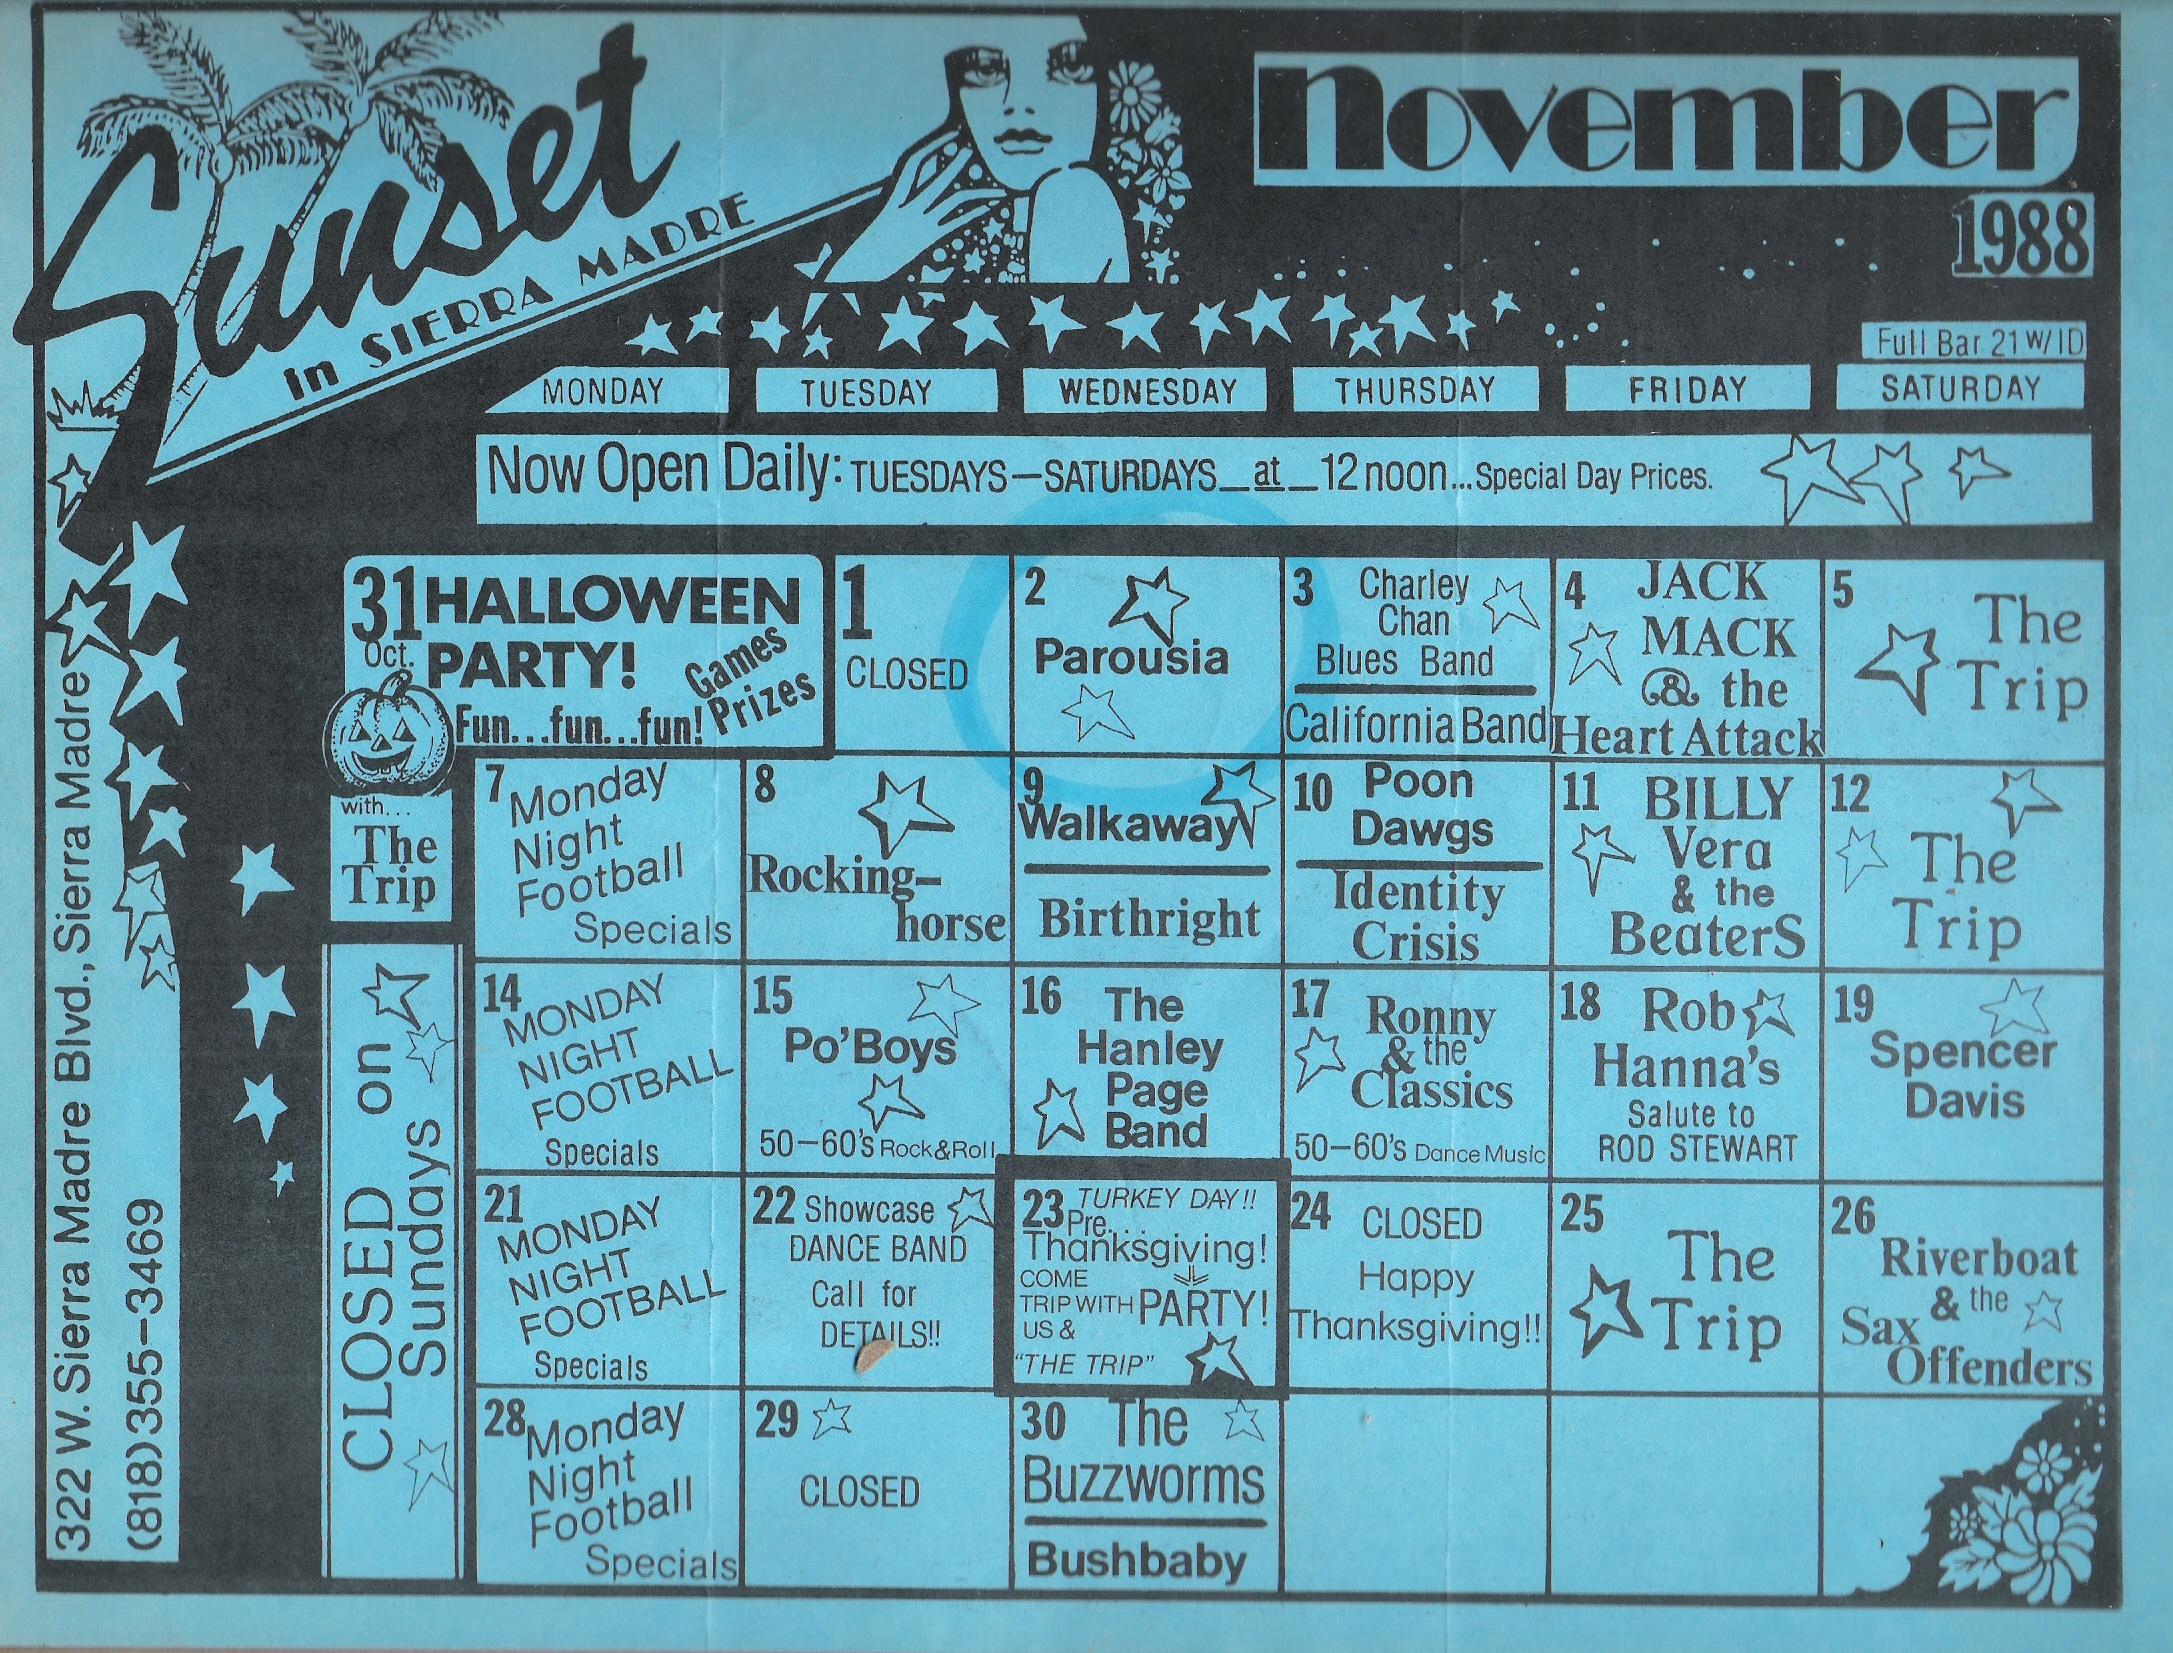 The Sunset Club Events Calendar, November 1988